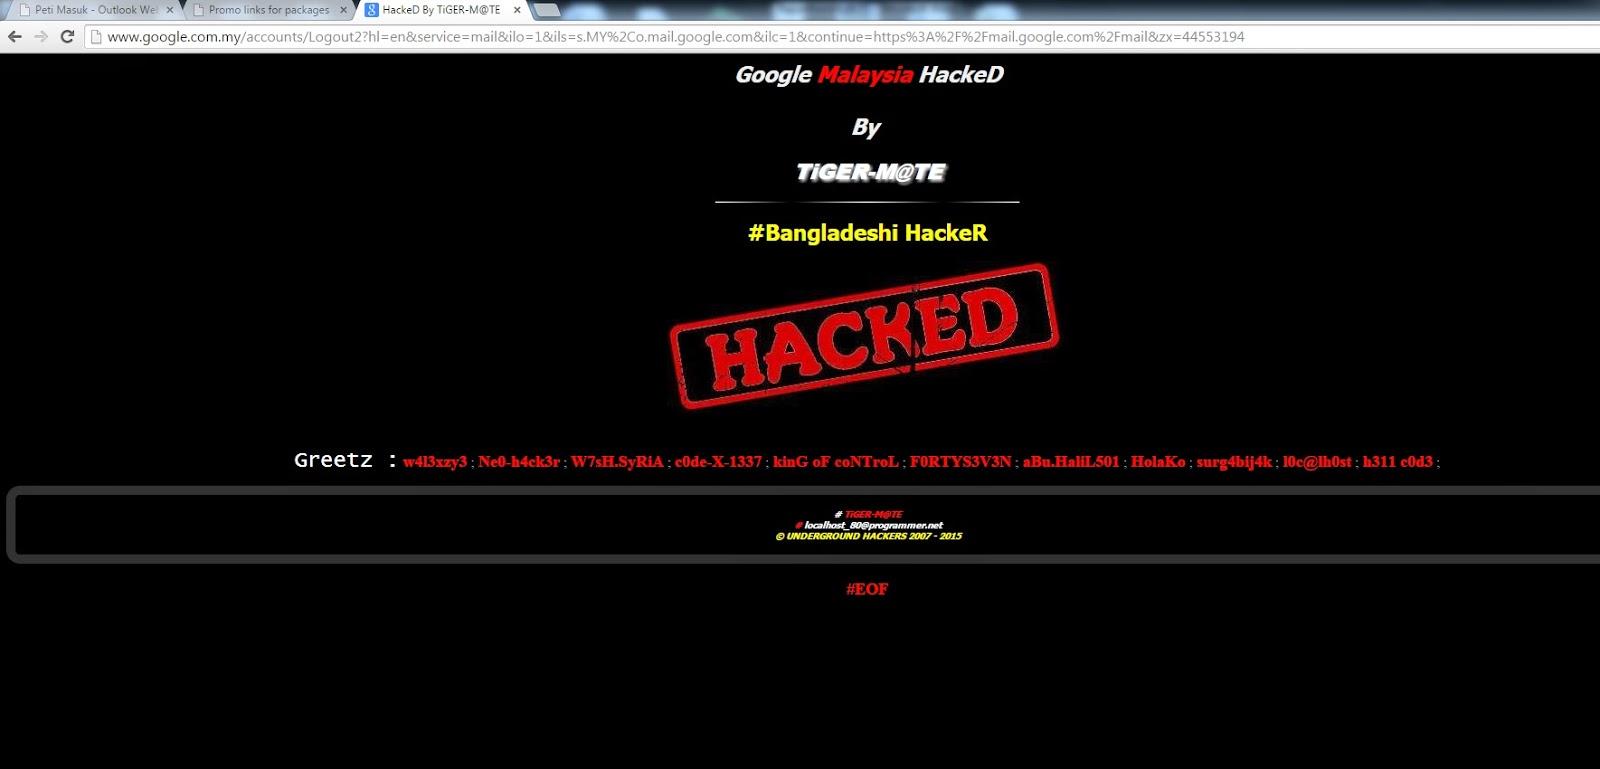 Google Malaysia kena Hacked petang tadi